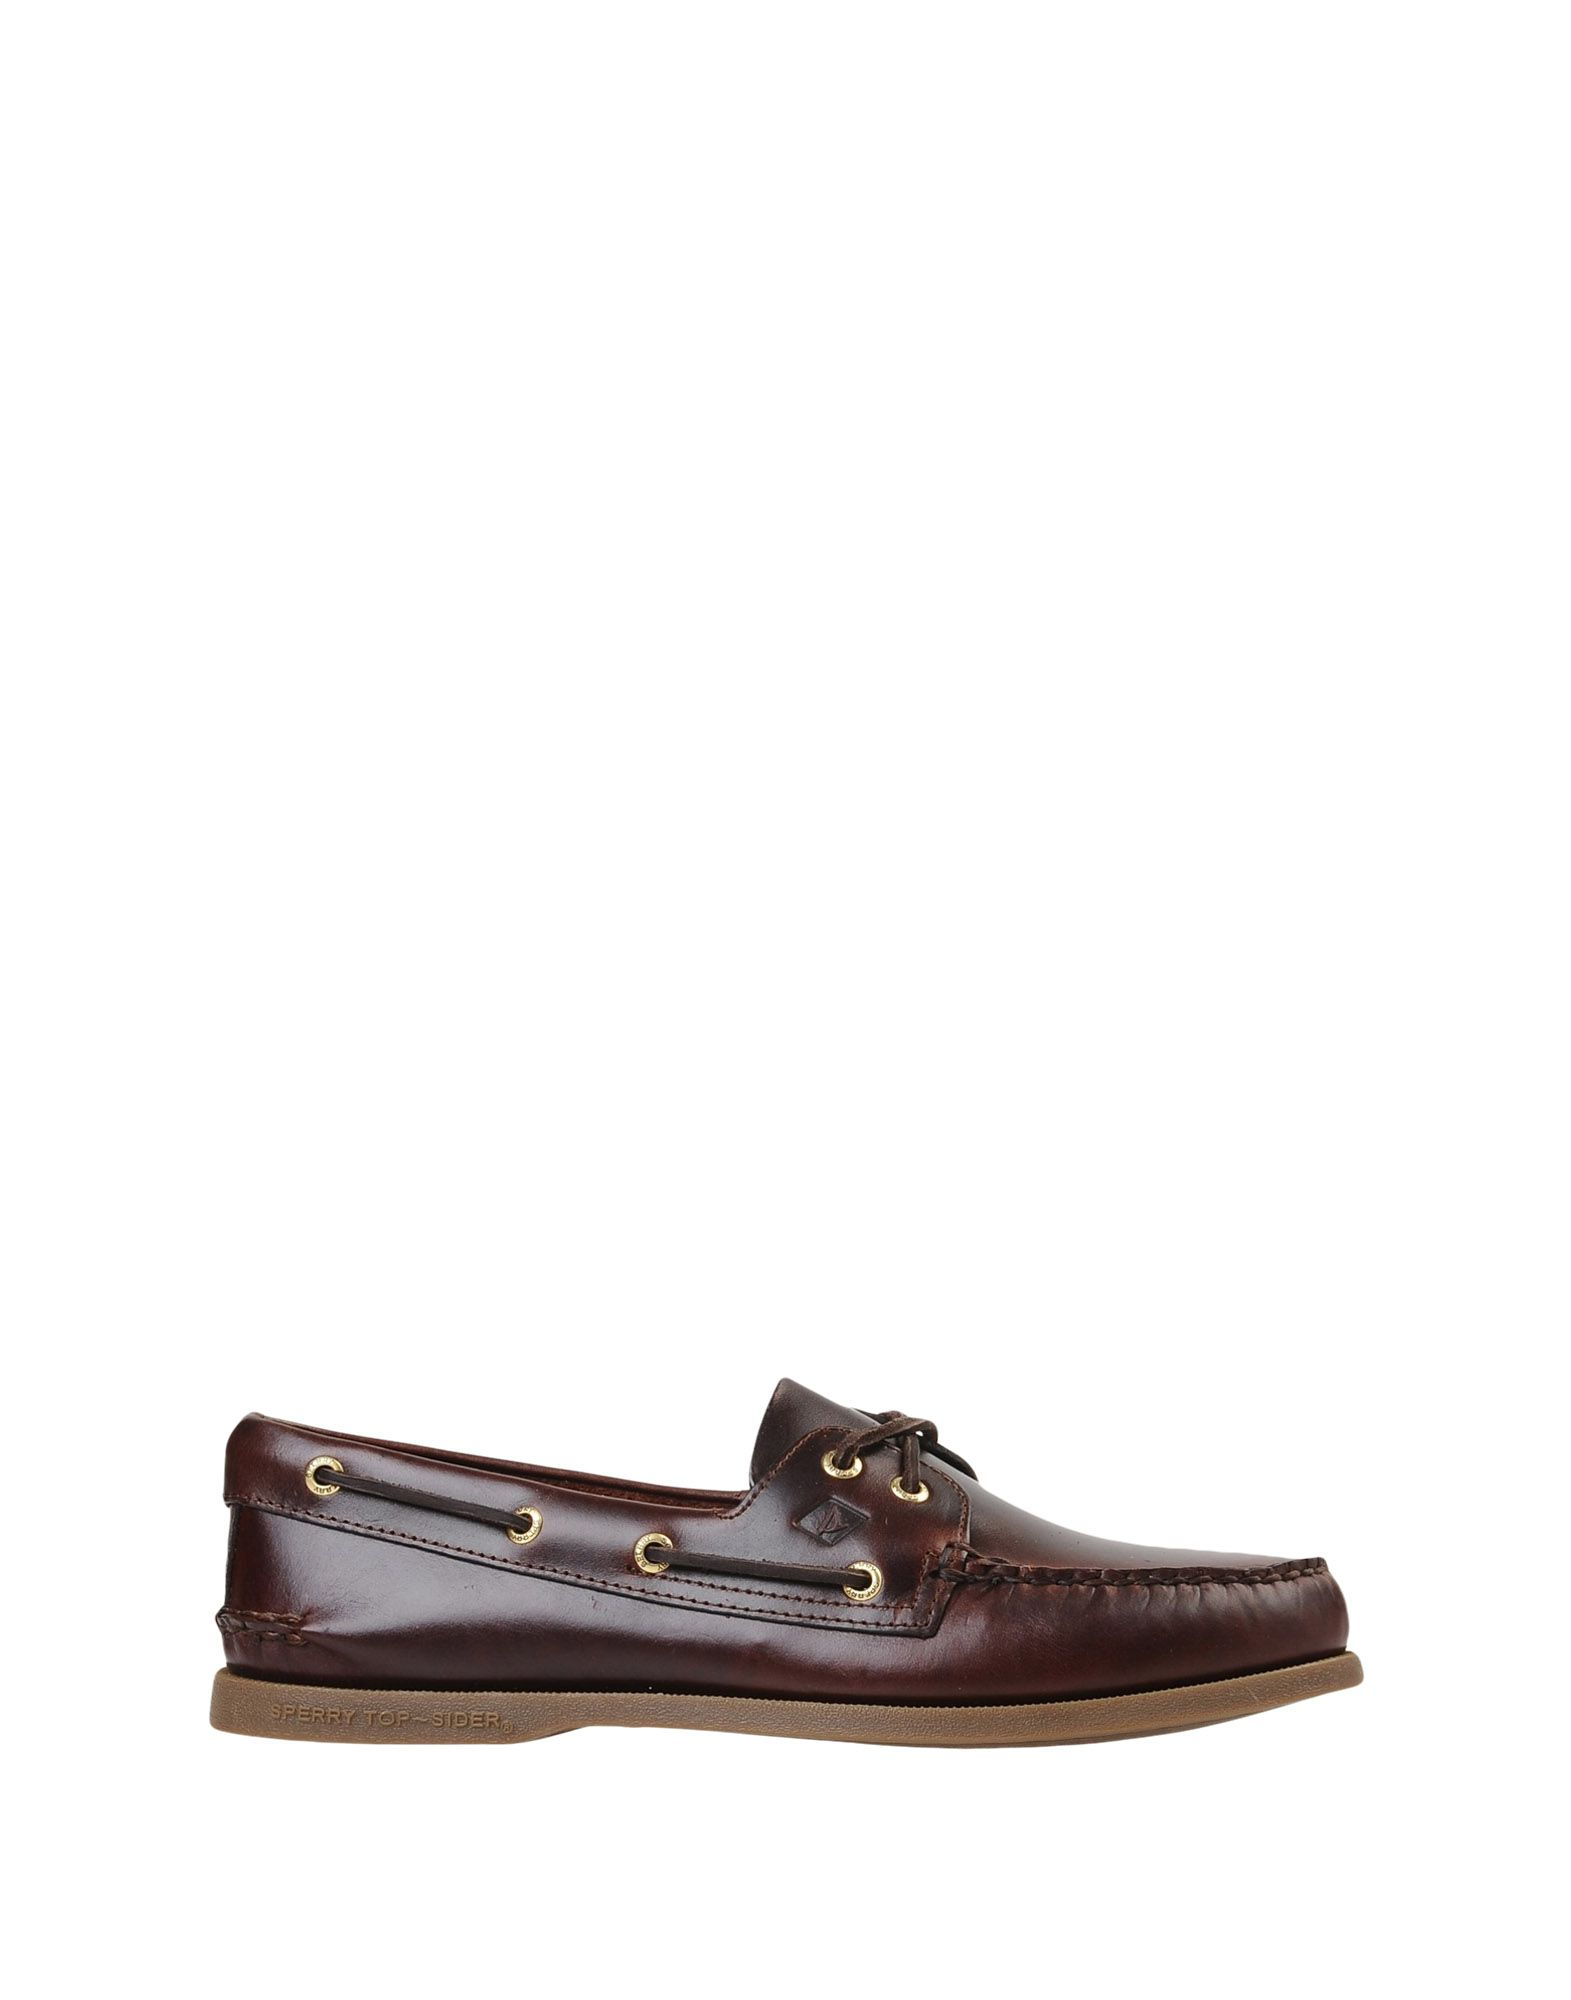 Sperry Top-Sider A/O 2-Eye - Loafers - Men Sperry Top-Sider Top-Sider Top-Sider Loafers online on  United Kingdom - 11456920EI 668893